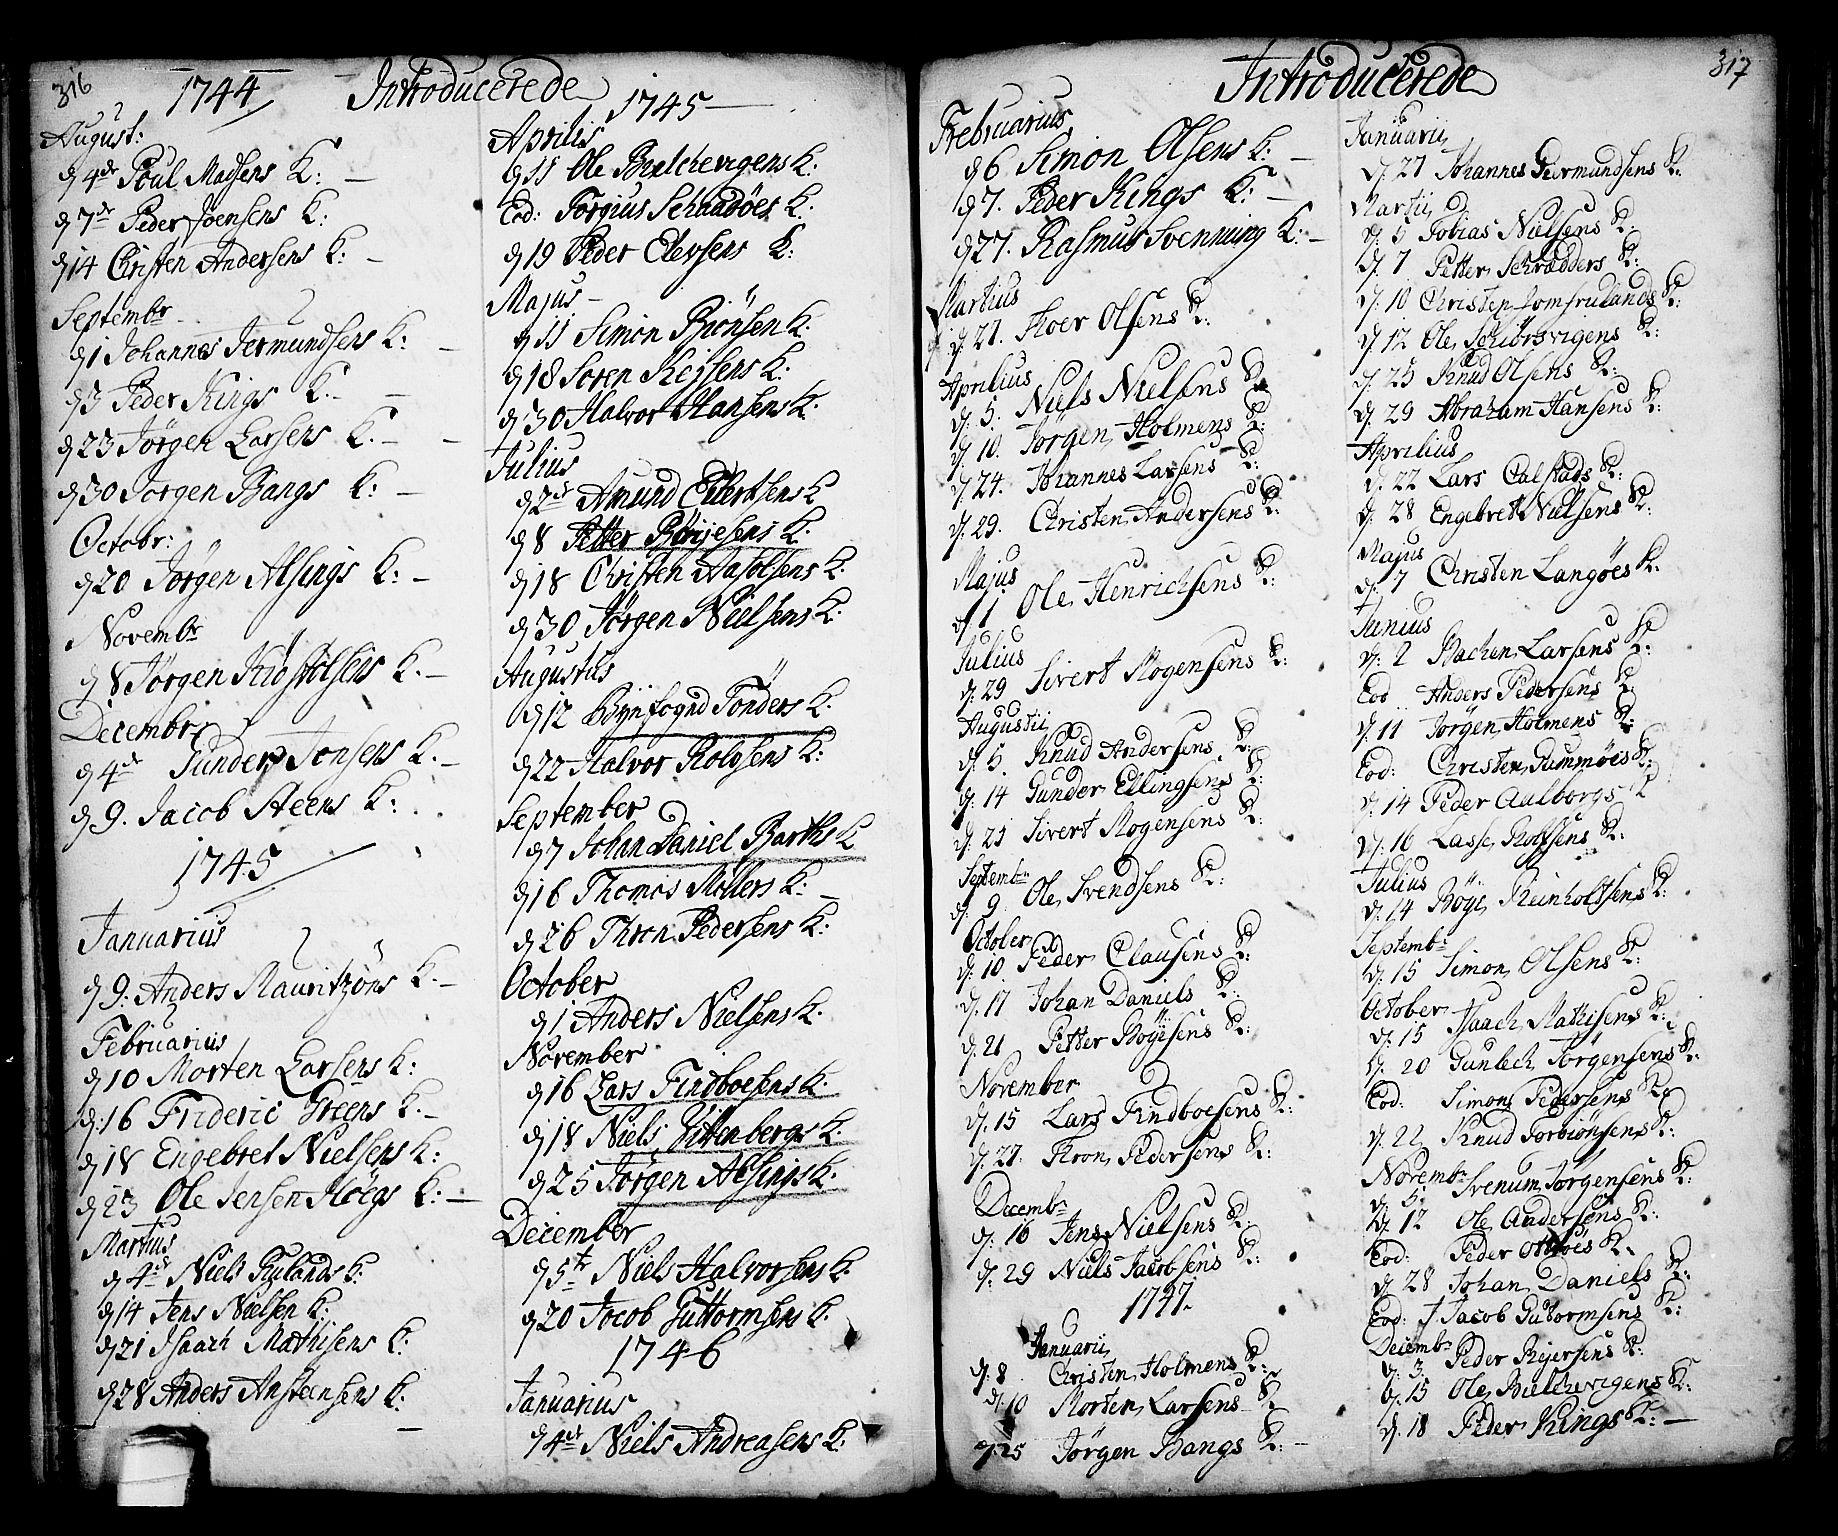 SAKO, Kragerø kirkebøker, F/Fa/L0001: Ministerialbok nr. 1, 1702-1766, s. 316-317